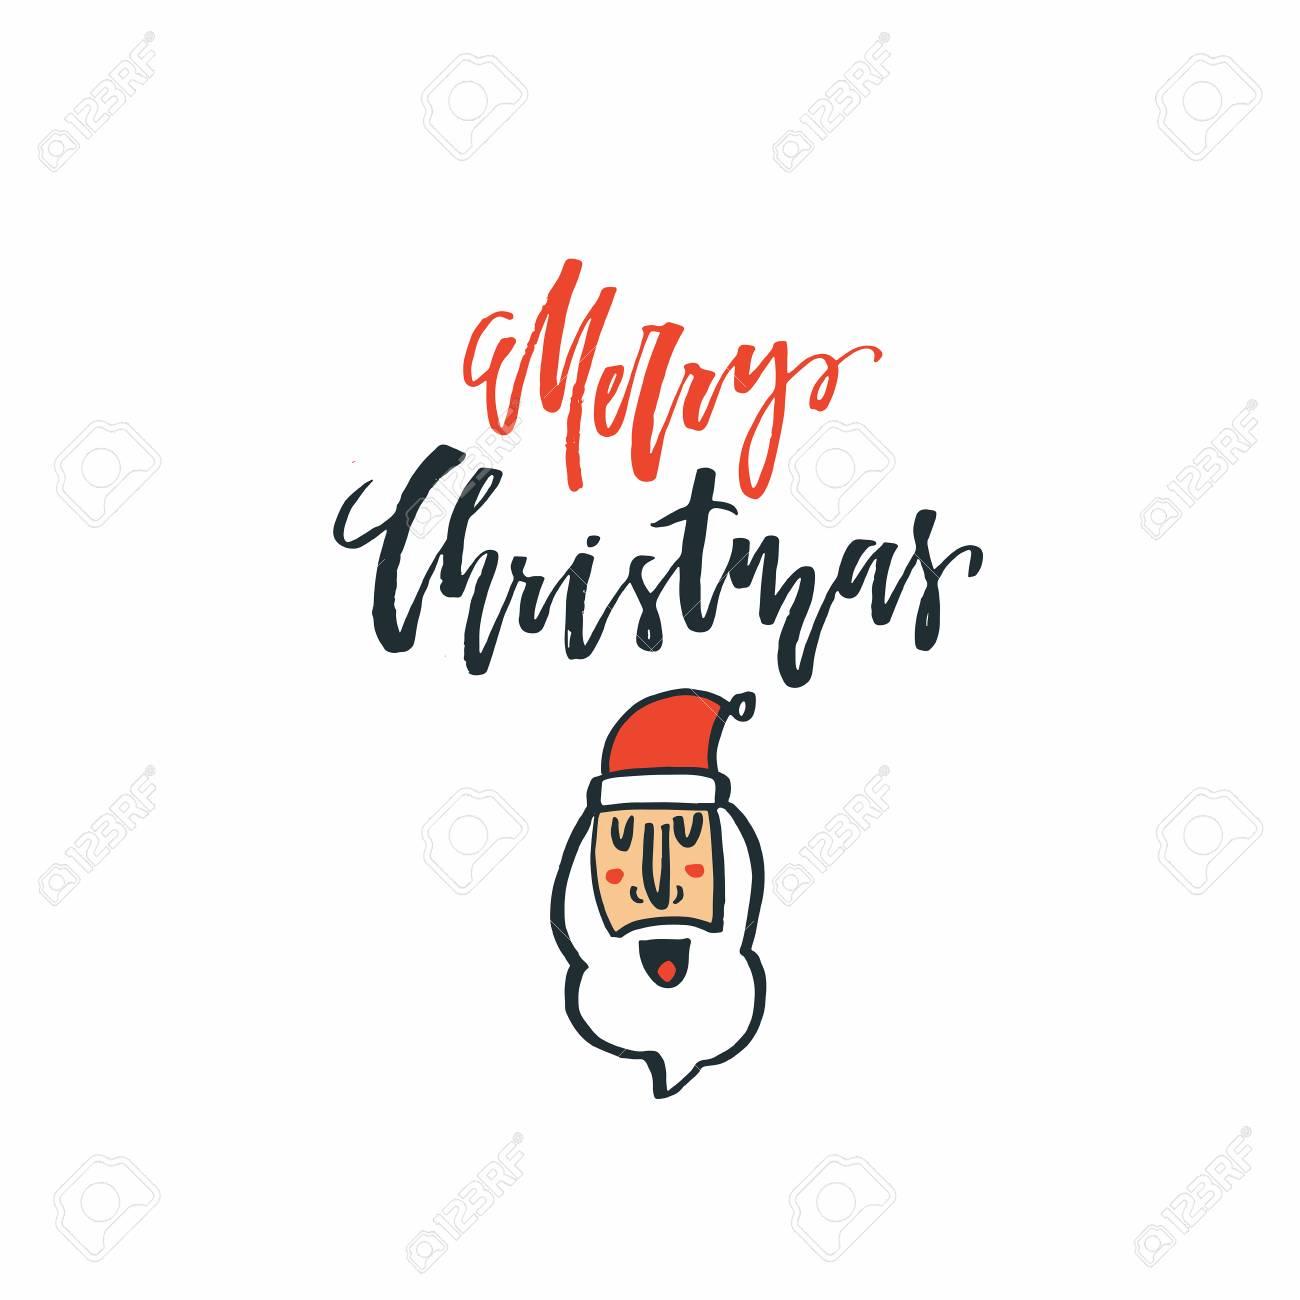 holiday calligraphy christmas design element vector clipart rh 123rf com holiday ornament vectors holiday ornament vectors